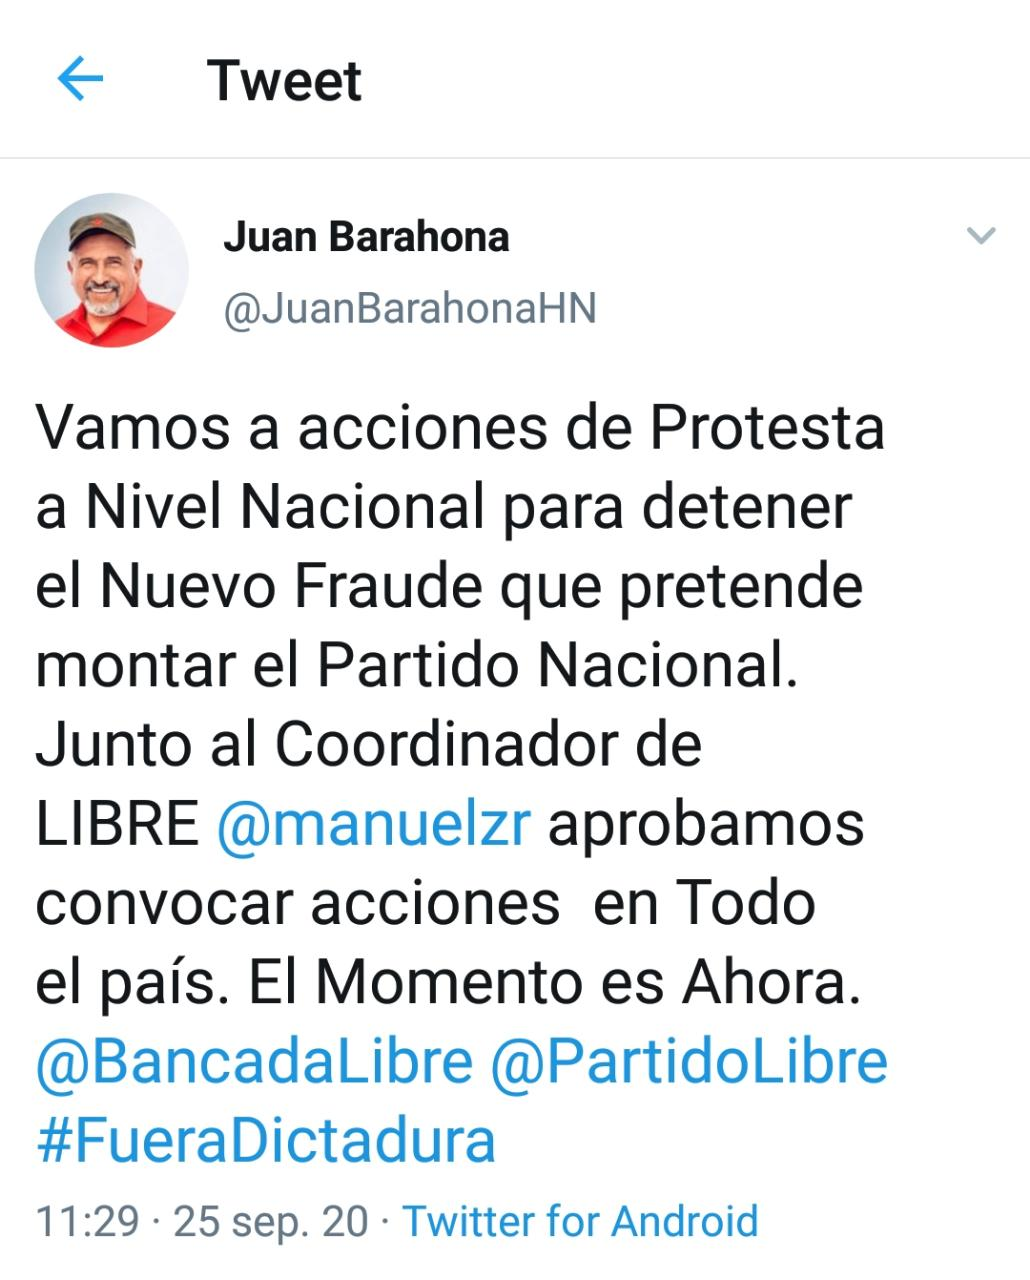 Juan Barahona